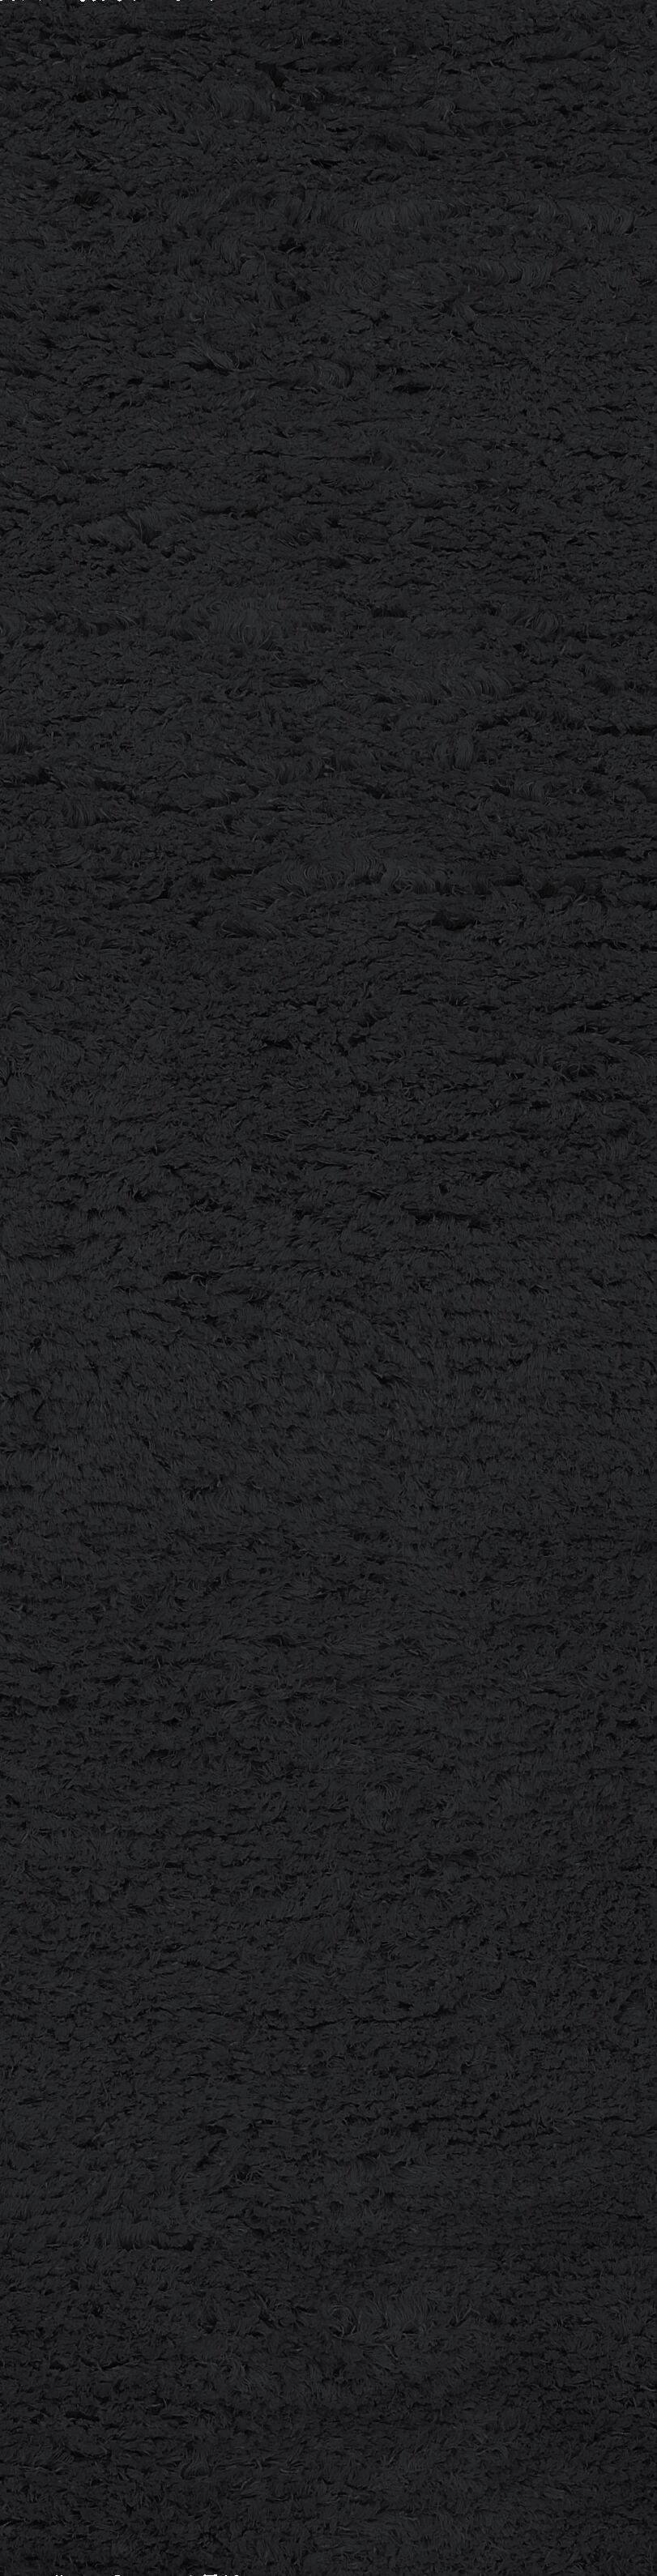 Gaston  Black Area Rug Rug Size: Runner 4' x 10'